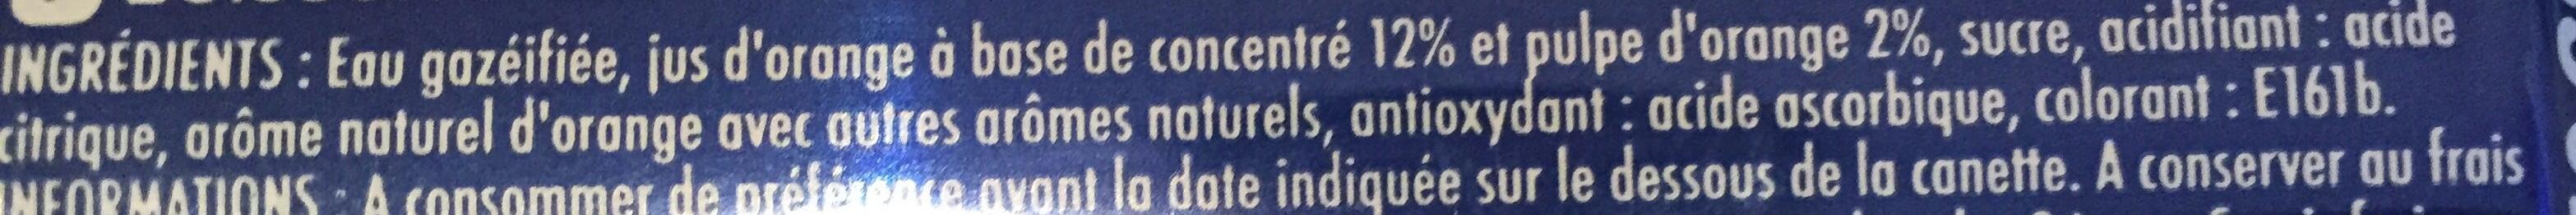 Pulp Orange - Ingredients - fr